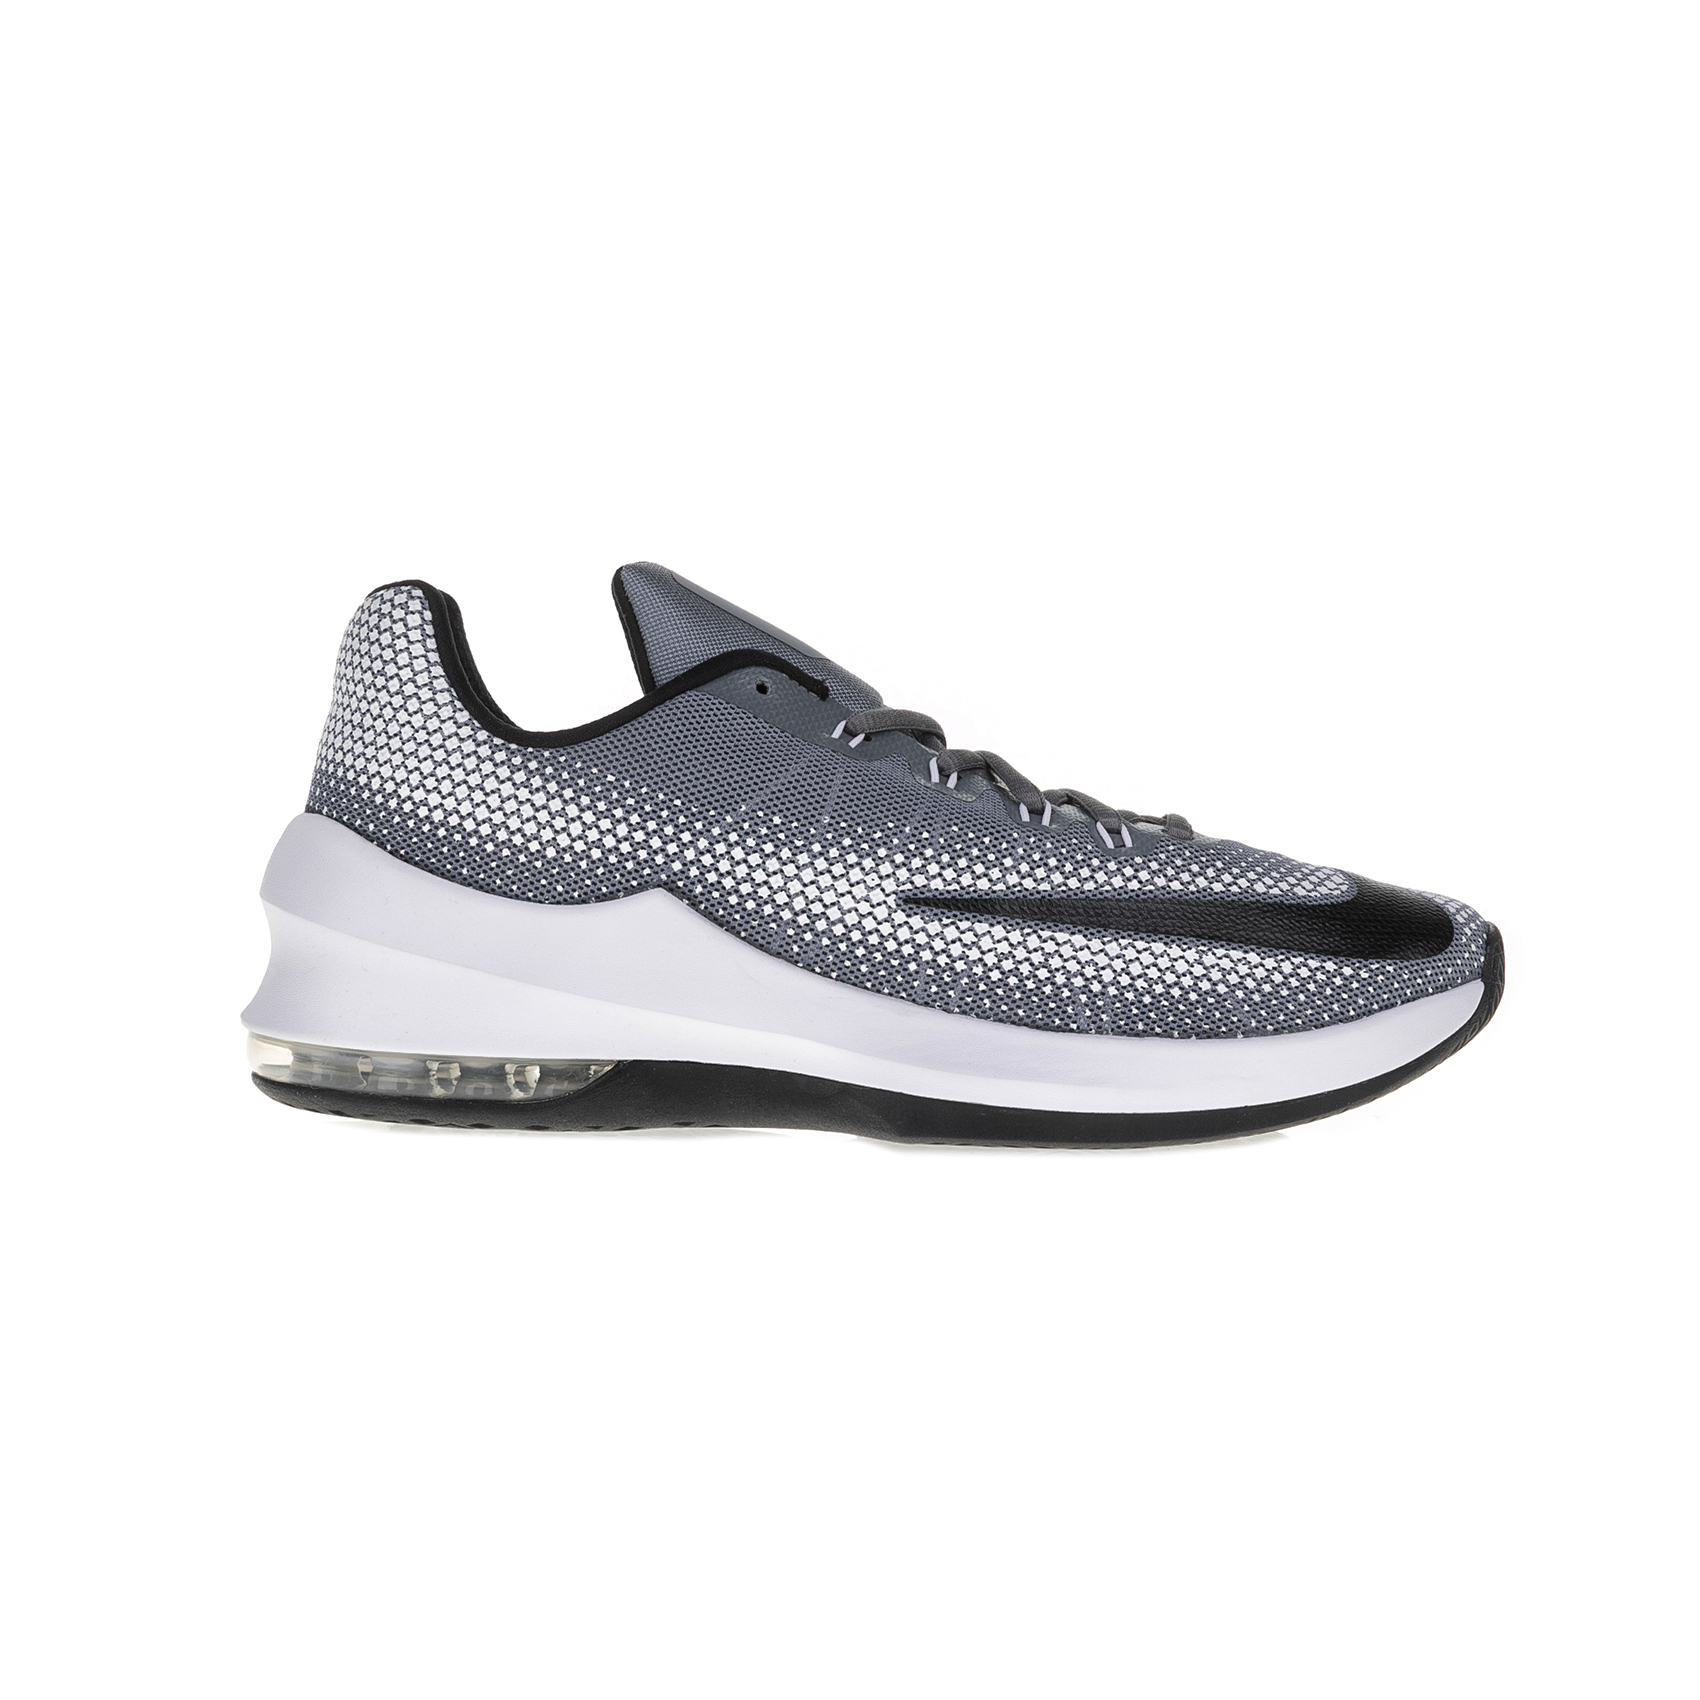 NIKE – Ανδρικά παπούτσια μπάσκετ Nike AIR MAX INFURIATE LOW λευκά – γκρι